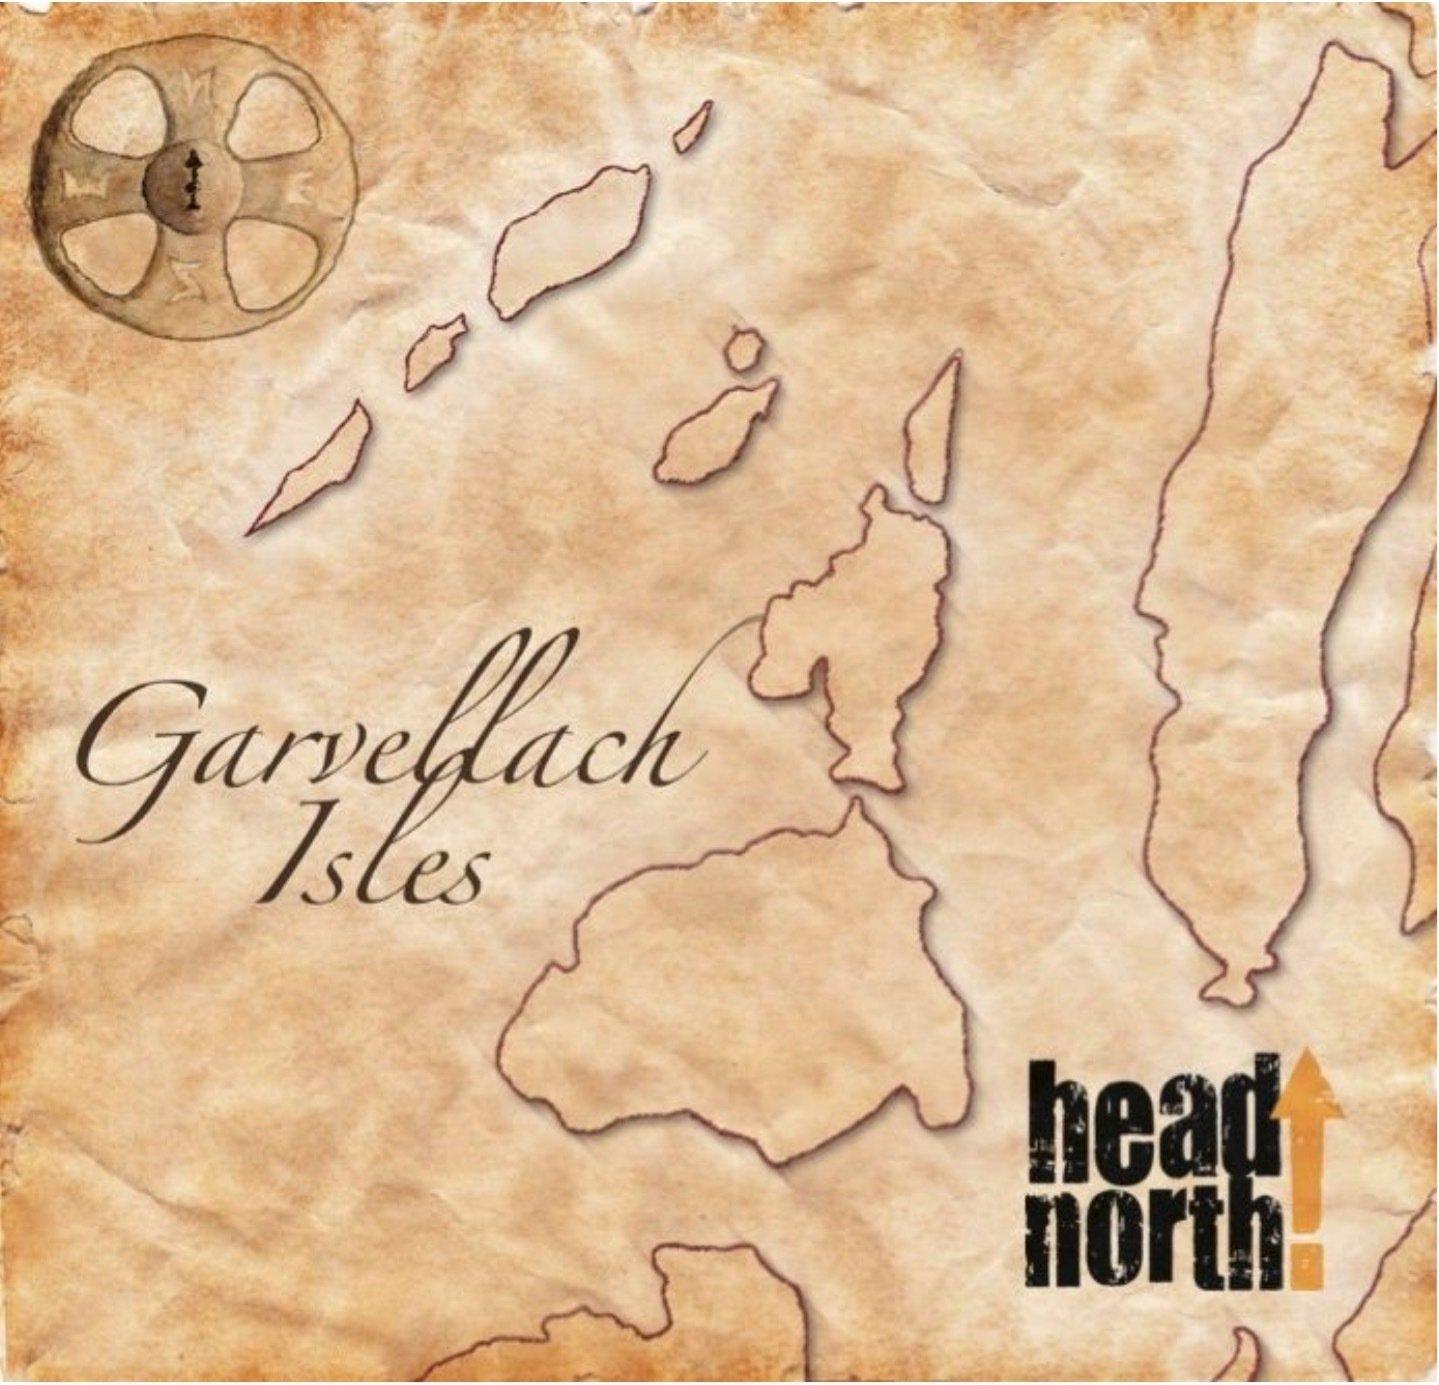 Garvellach Isles